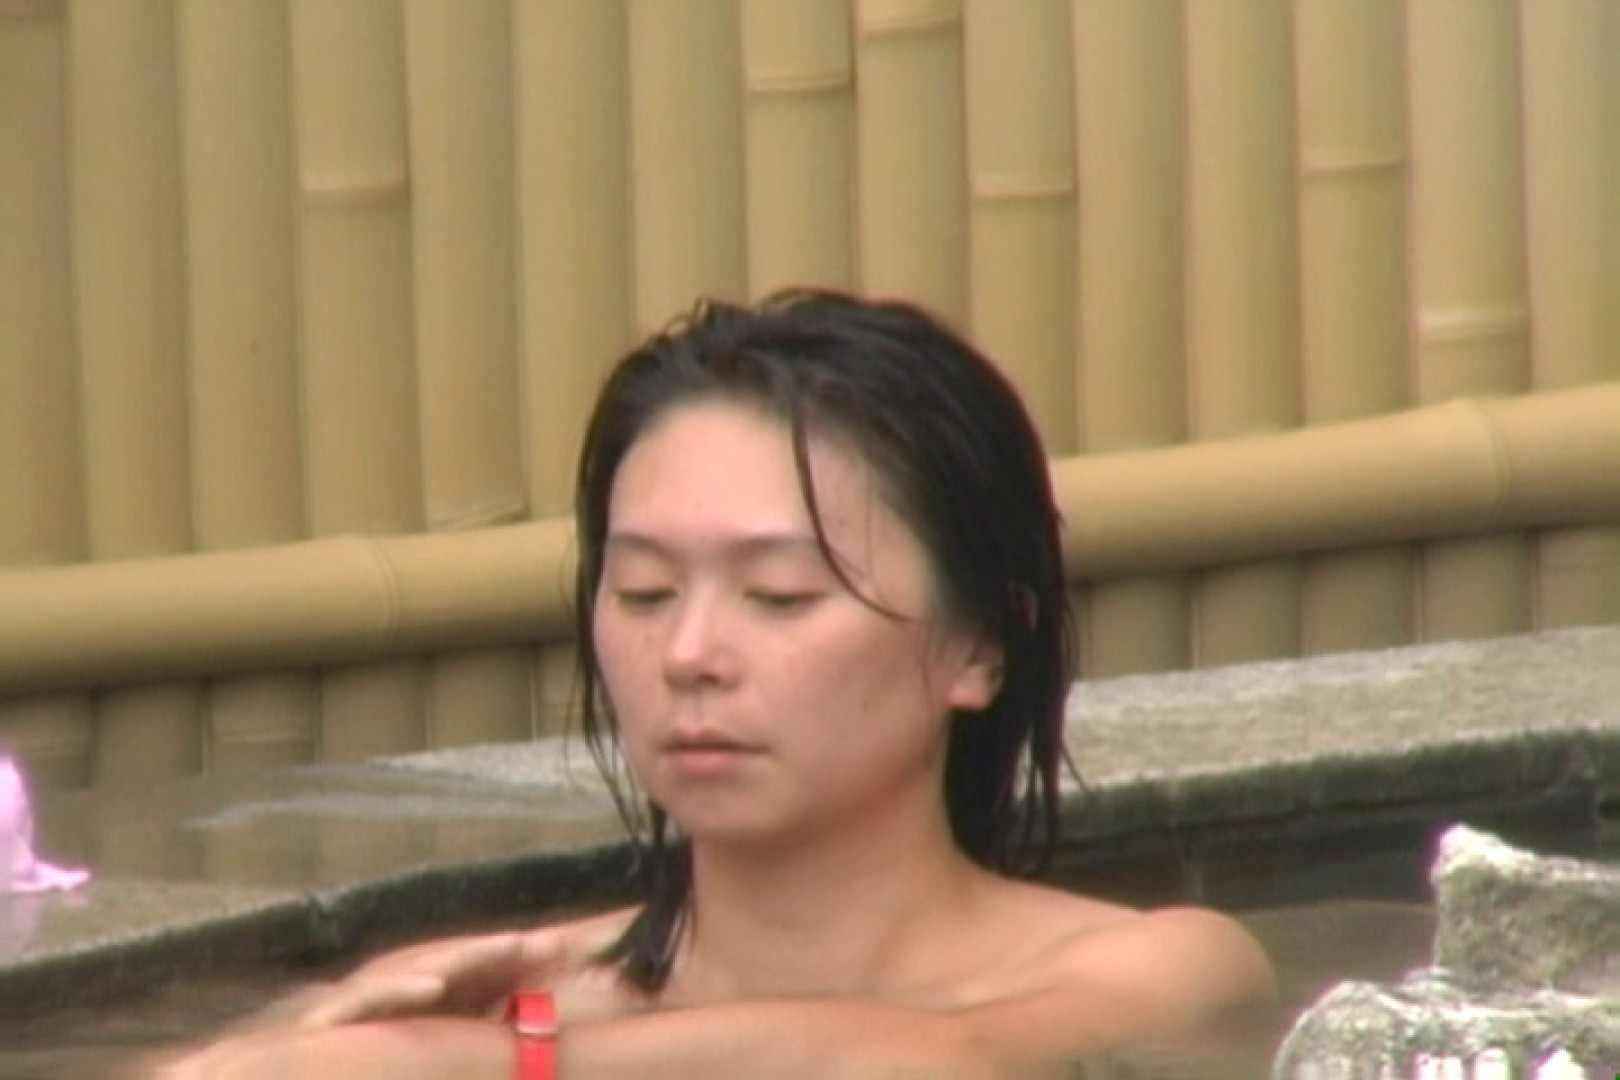 Aquaな露天風呂Vol.619 盗撮シリーズ | 露天風呂編  75PIX 23